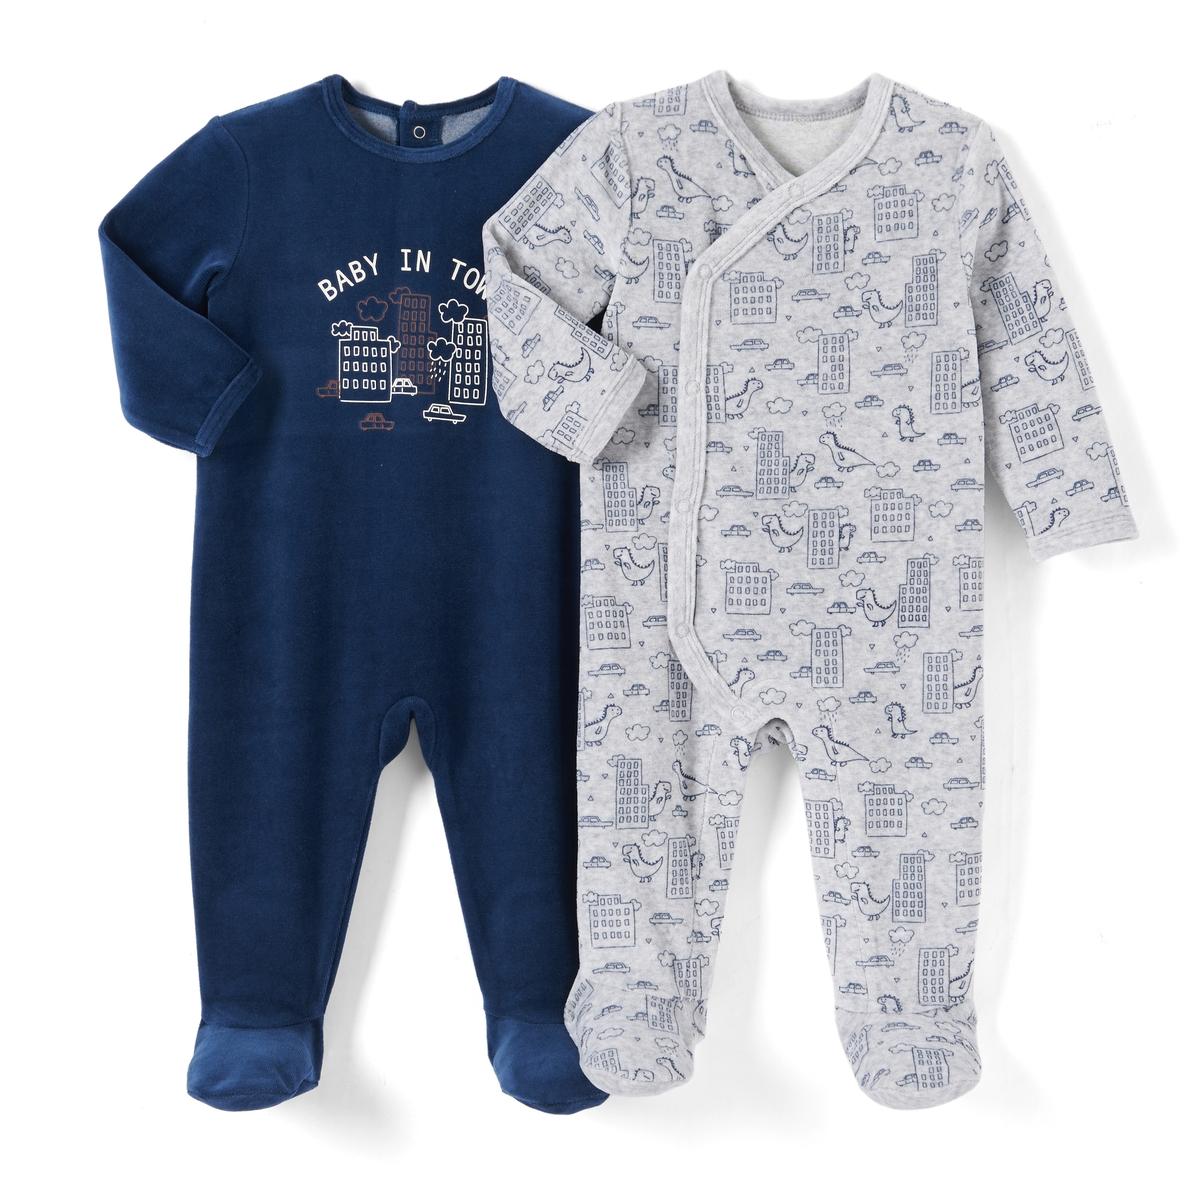 Комплект из 2 пижам, 0 месяцев - 3 года